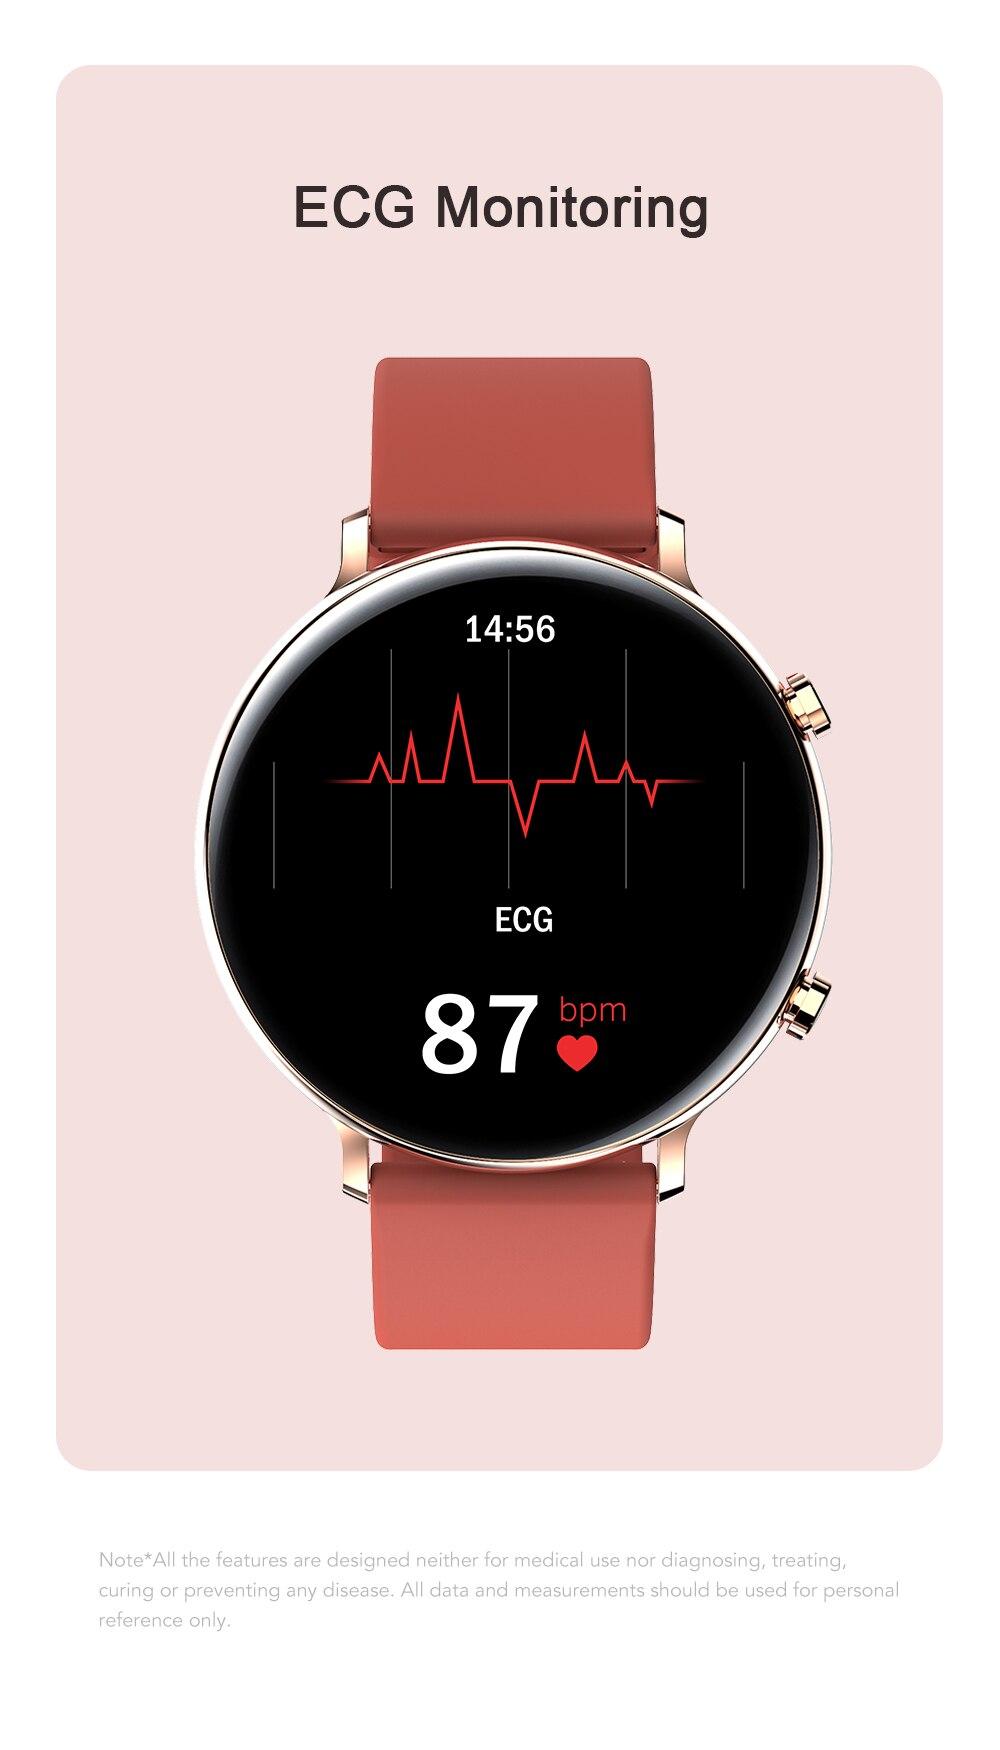 Hf82c5b9ca5f346cabdde7031c129780as SANLEPUS 2021 Smart Watch Dial Calls Men Women Waterproof Smartwatch ECG PPG Fitness Bracelet Band For Android Apple Xiaomi